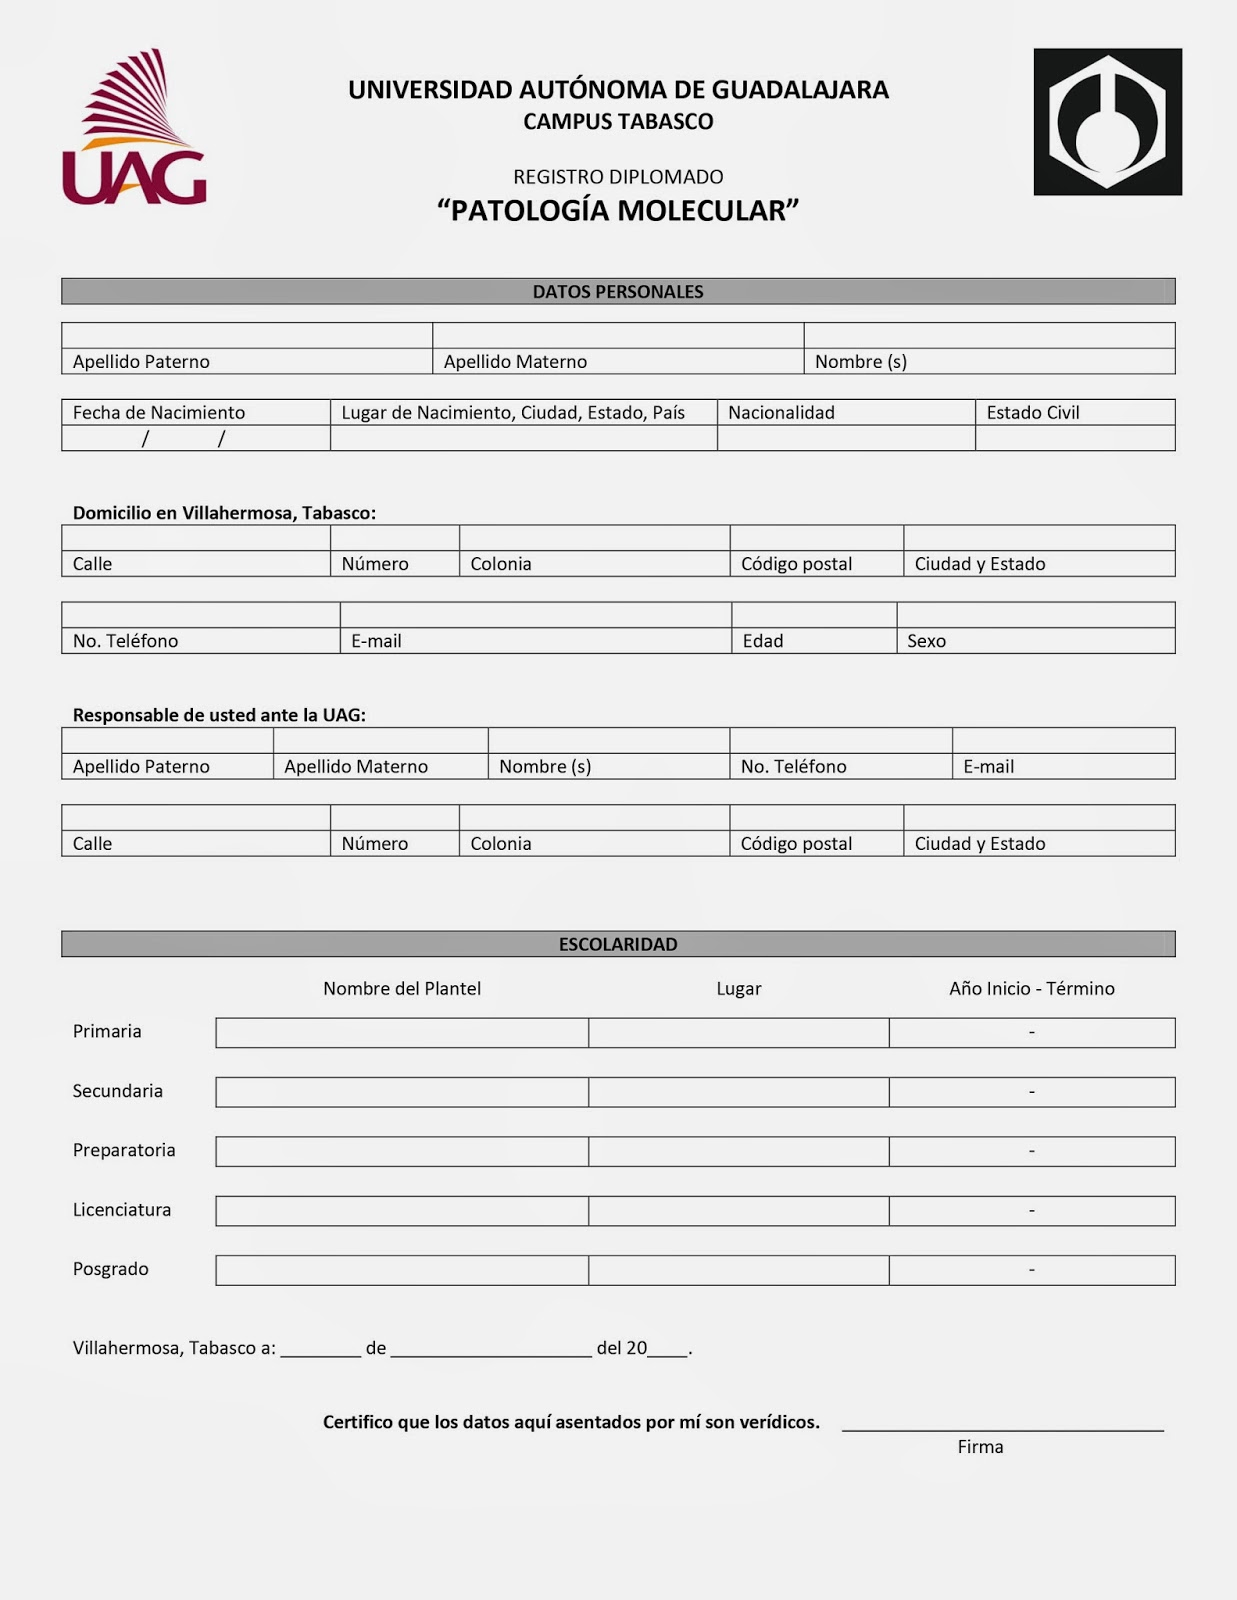 Químico Farmacéutico Biólogo UAG Tabasco: HOJA DE REGISTRO ...